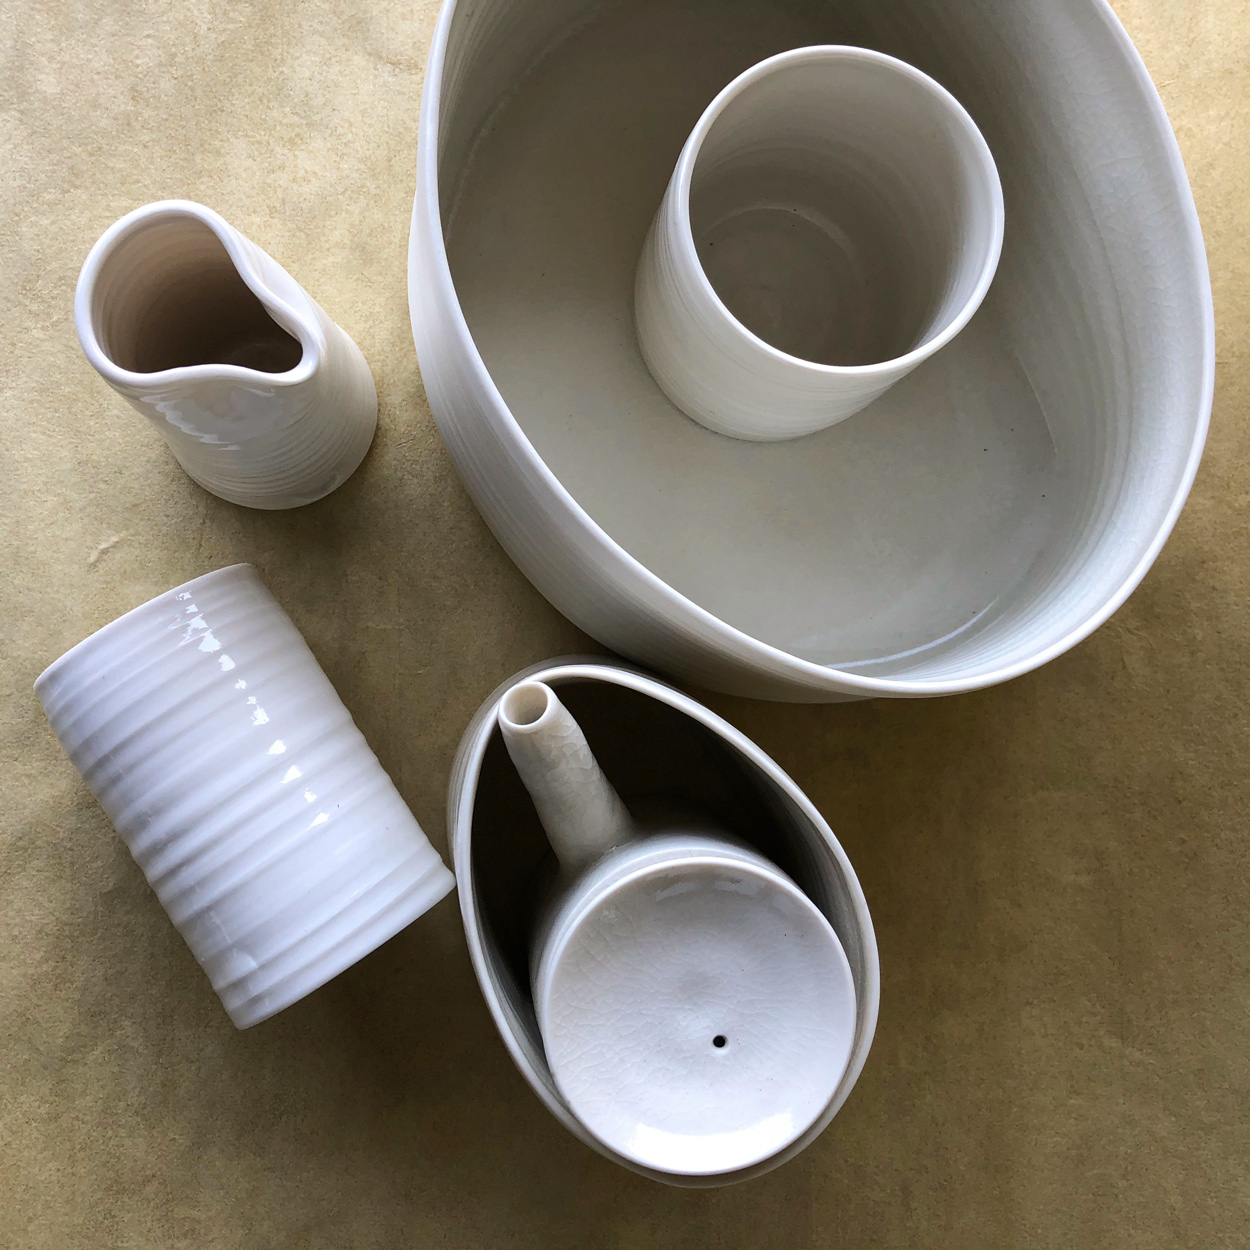 Tea-pot-Ceramic-Julie-Anne-Hargreaves-Galerie-h-Geneva